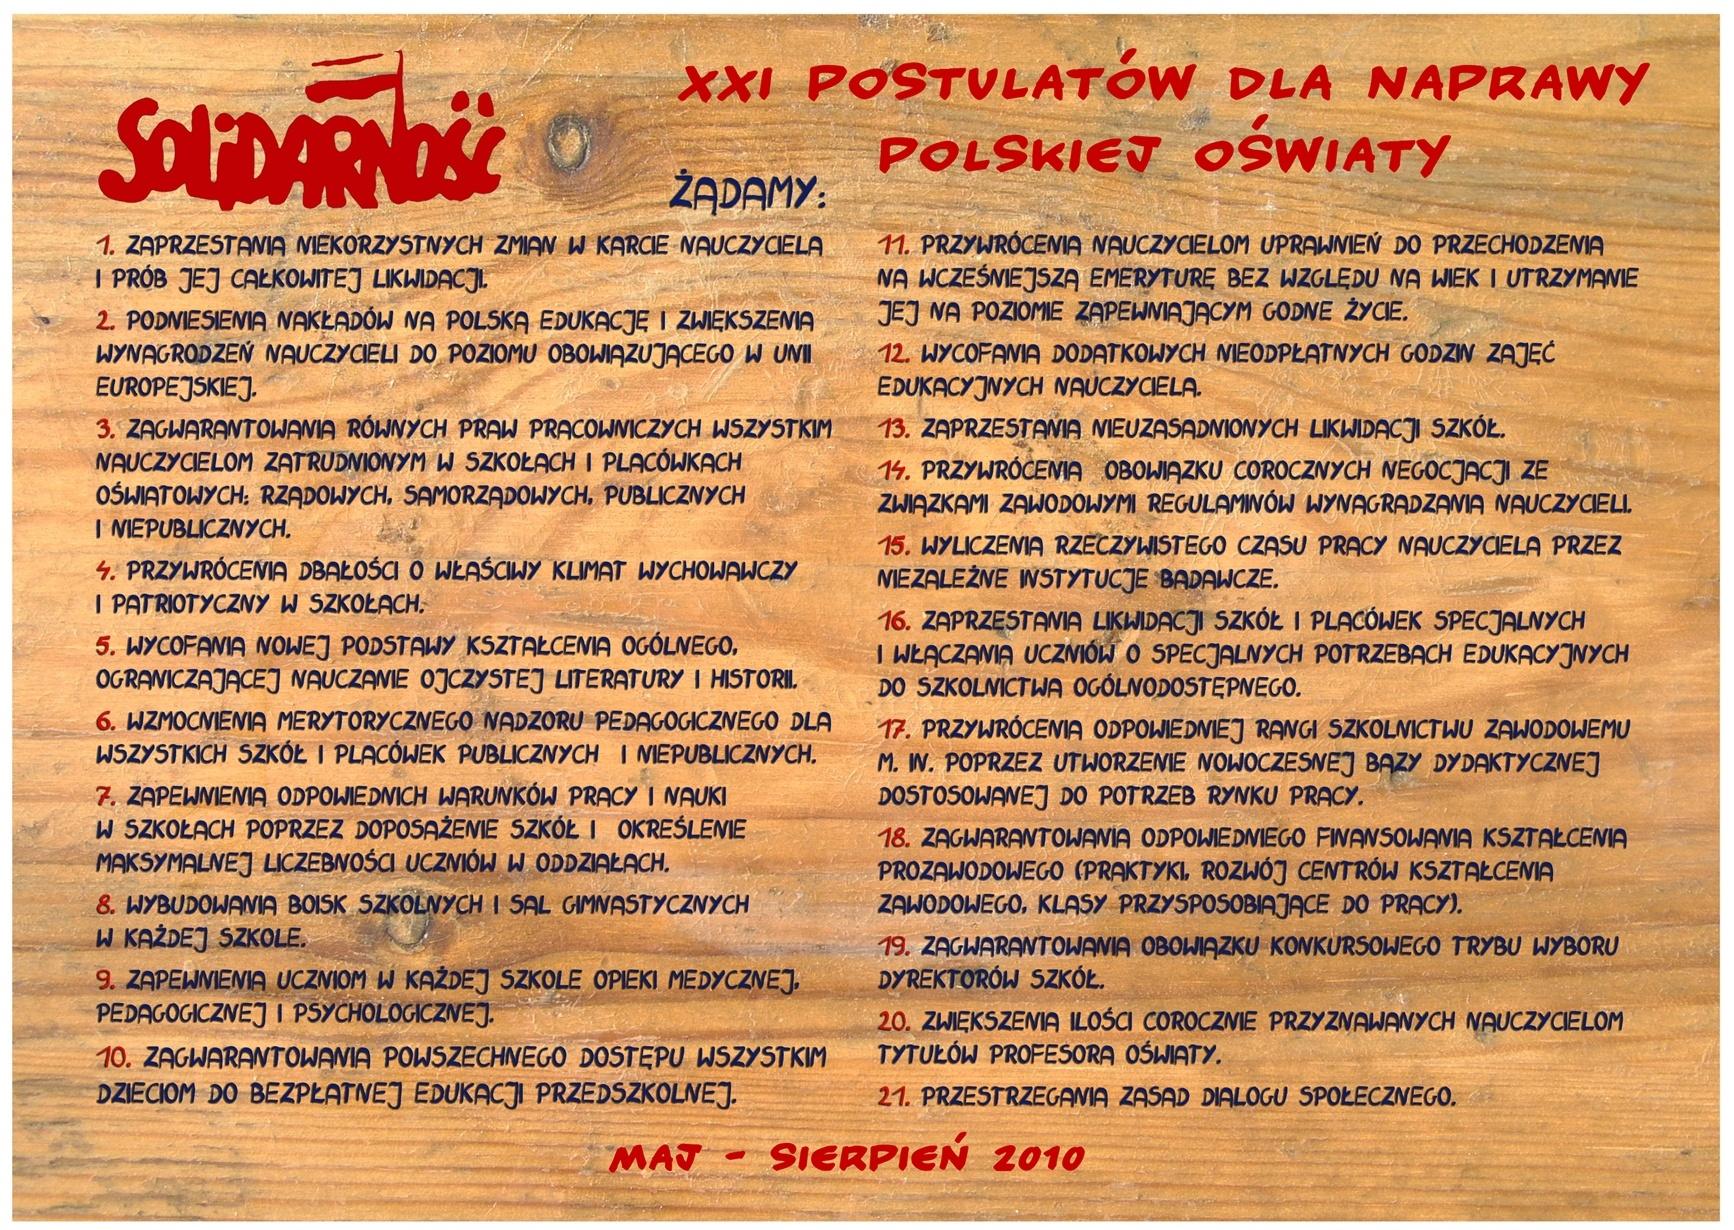 21postulatow-plakat4a